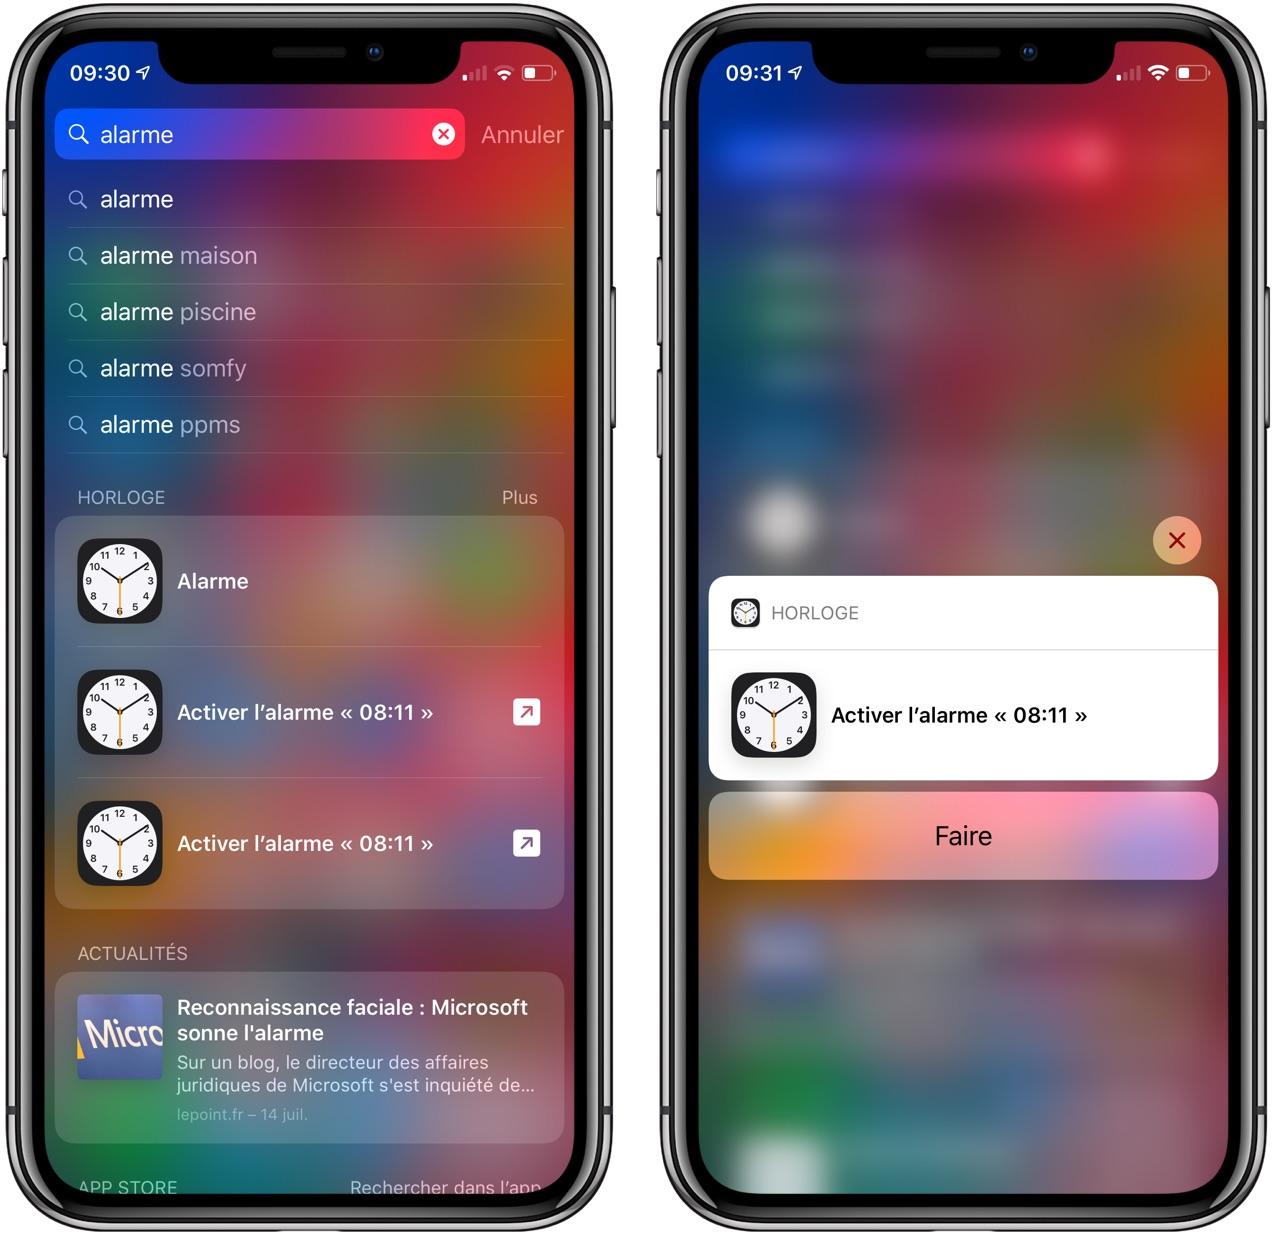 "Astuce iOS 12 : comment programmer un de ses réveils habituels rapidement avec la recherche ""Spotlight"" 1"